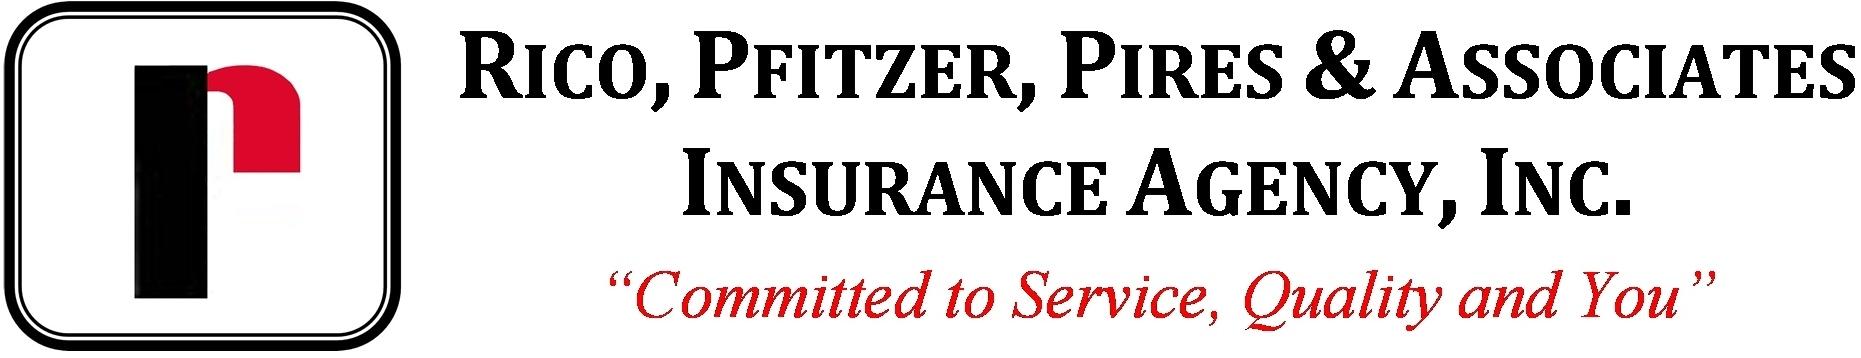 Rico, Pfitzer, Pires & Associates Insurance Agency - ad image